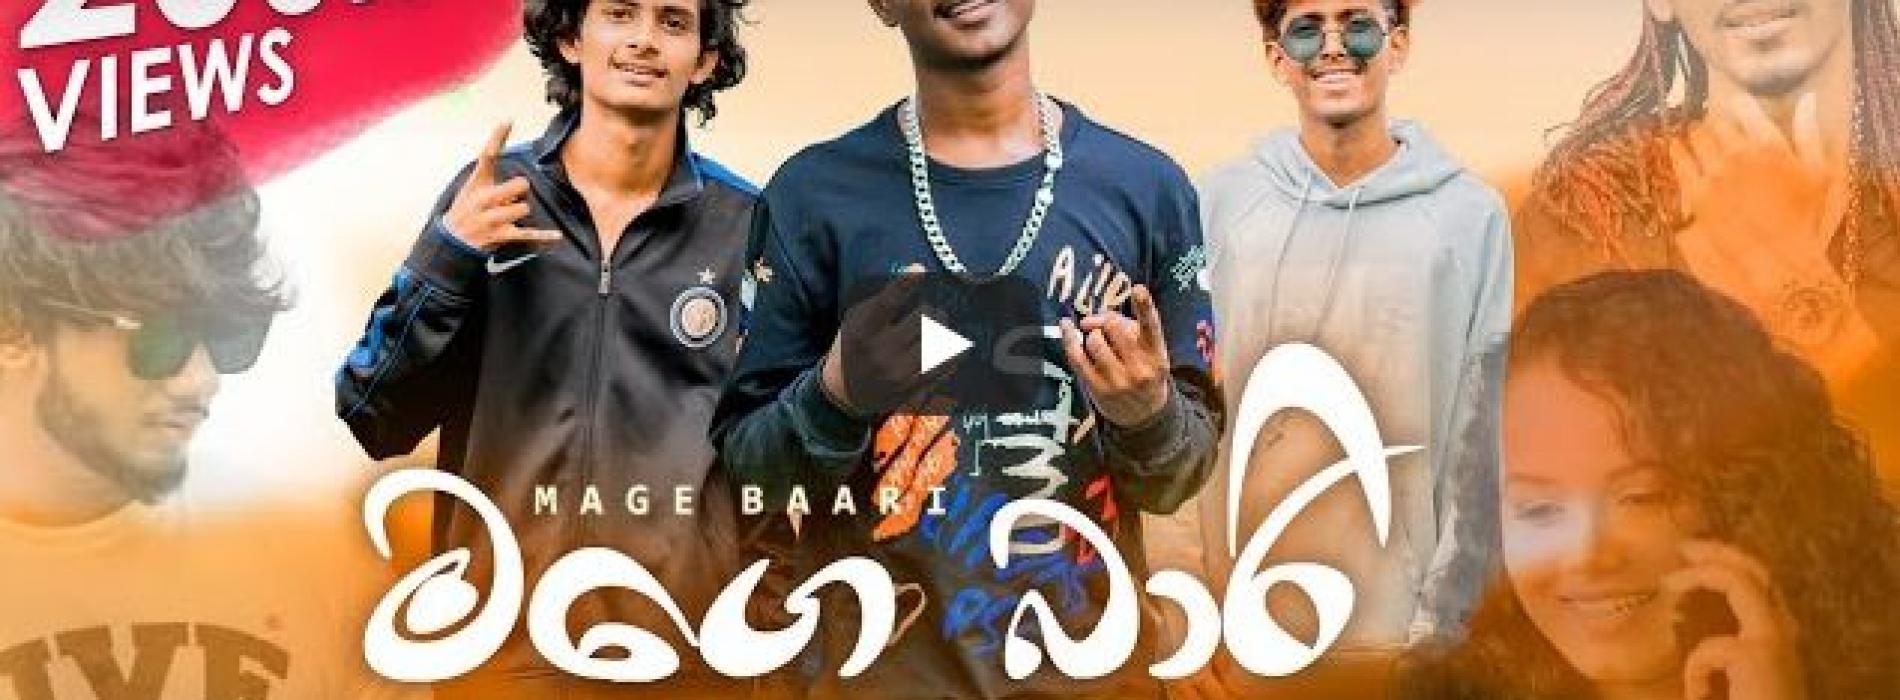 New Music : Mage Baari   මගෙ බාරි   Irshad Bro   Minu DS   Bobby KY Official Music Video